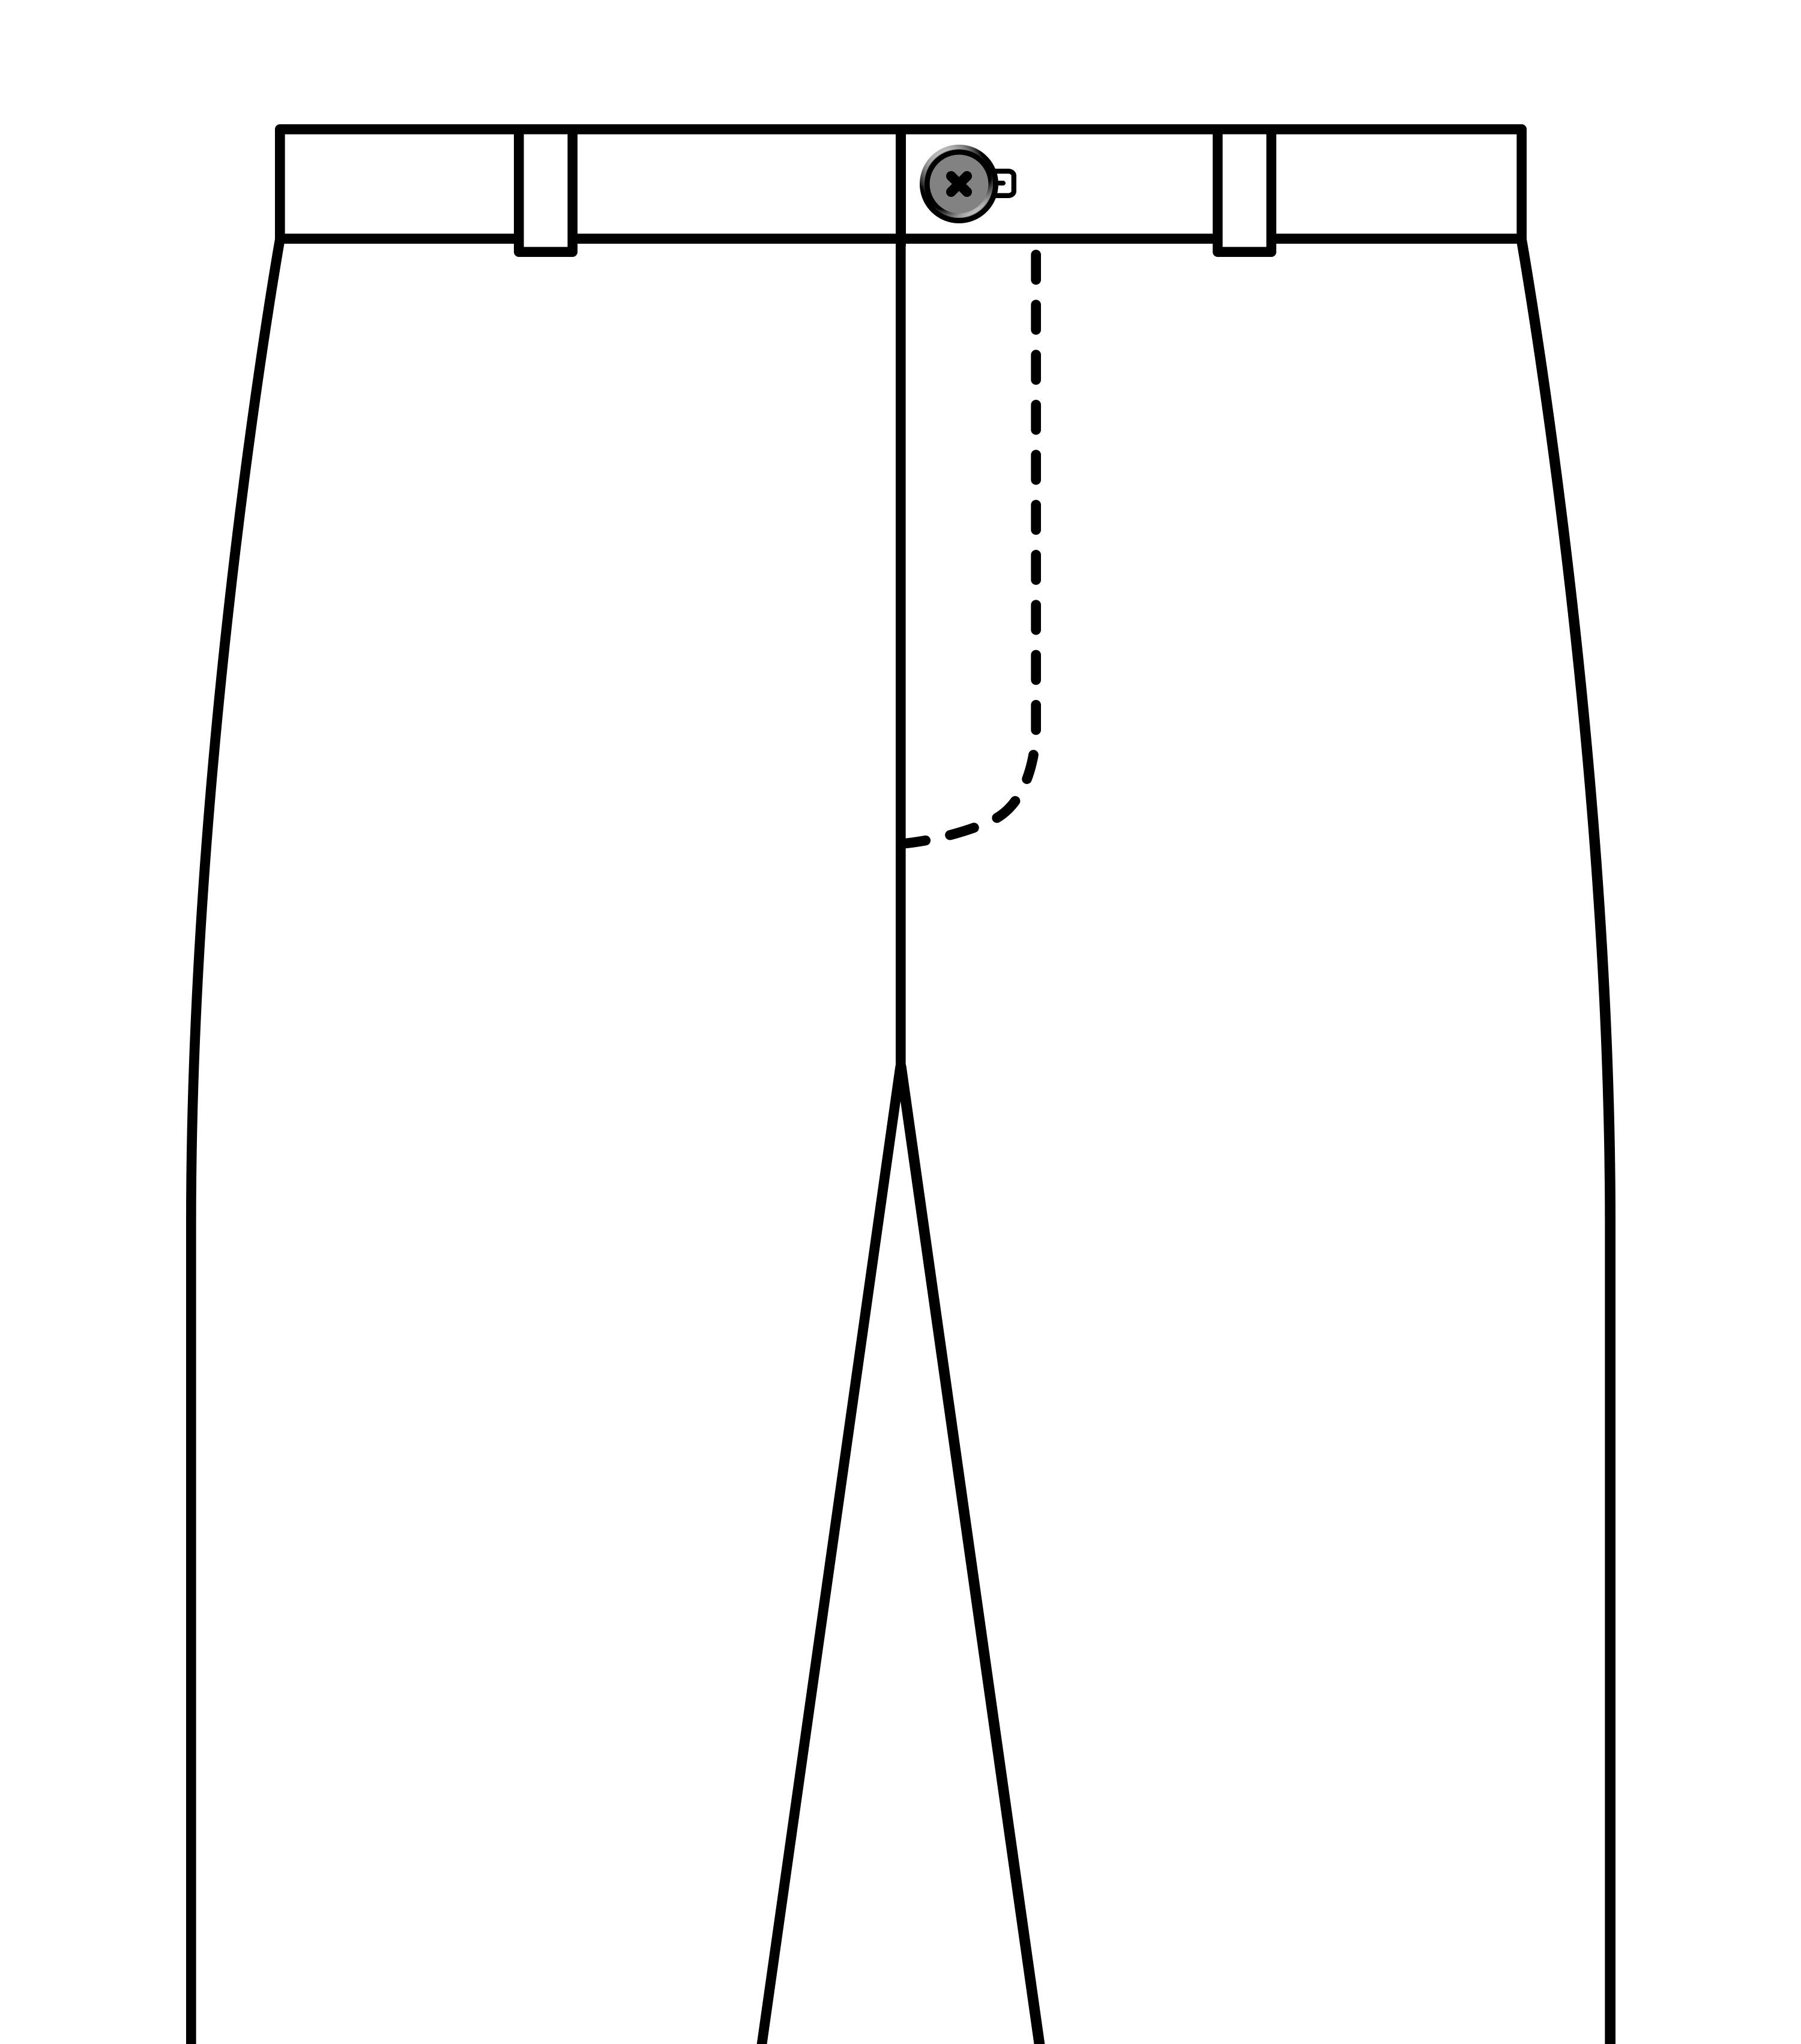 Centered fastening